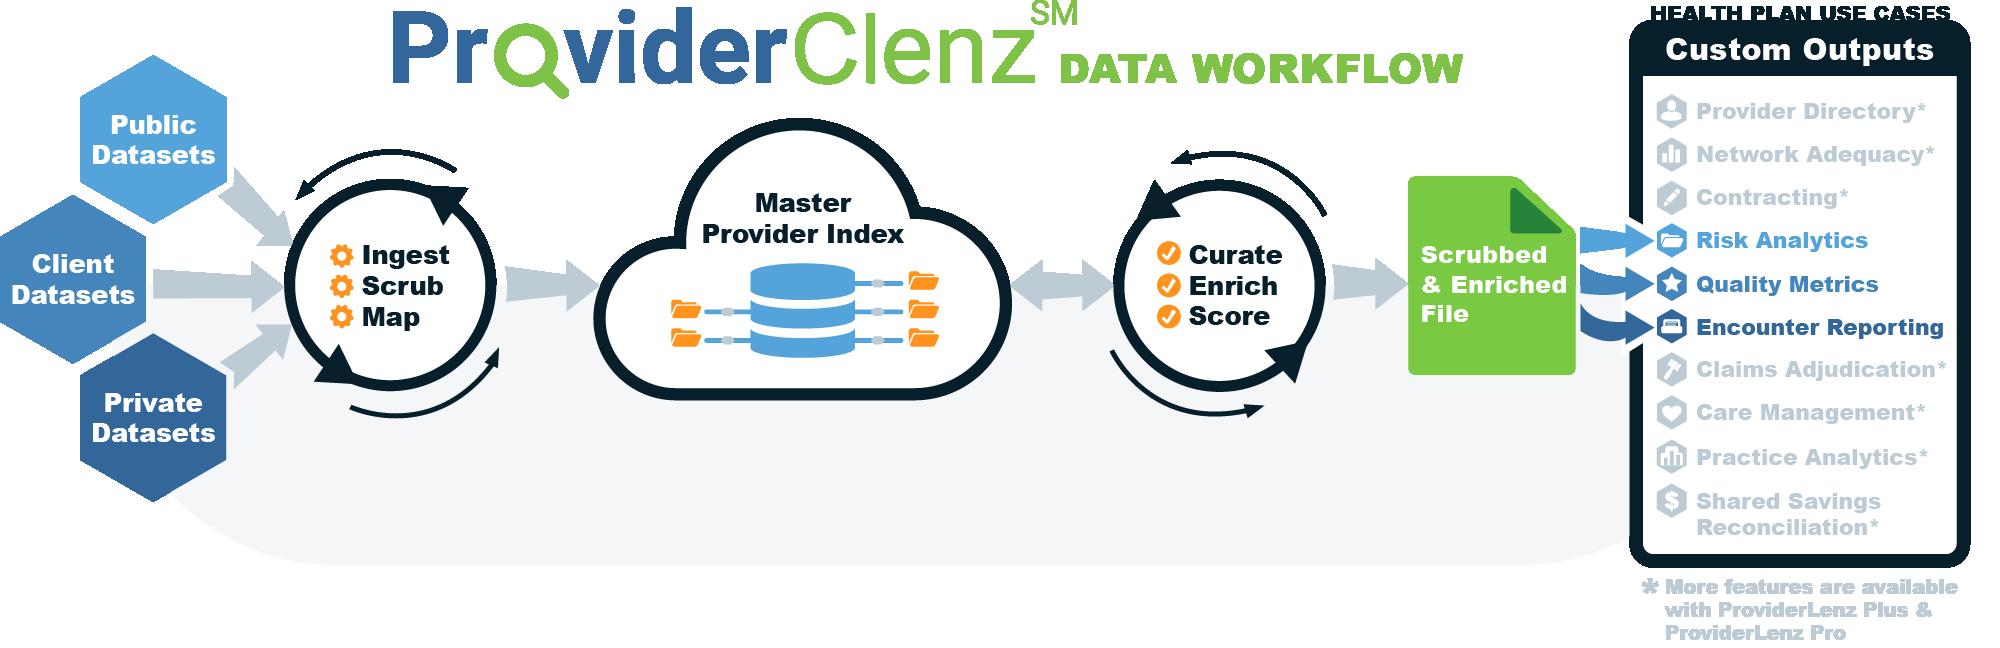 ProviderClenz Workflow Graphic